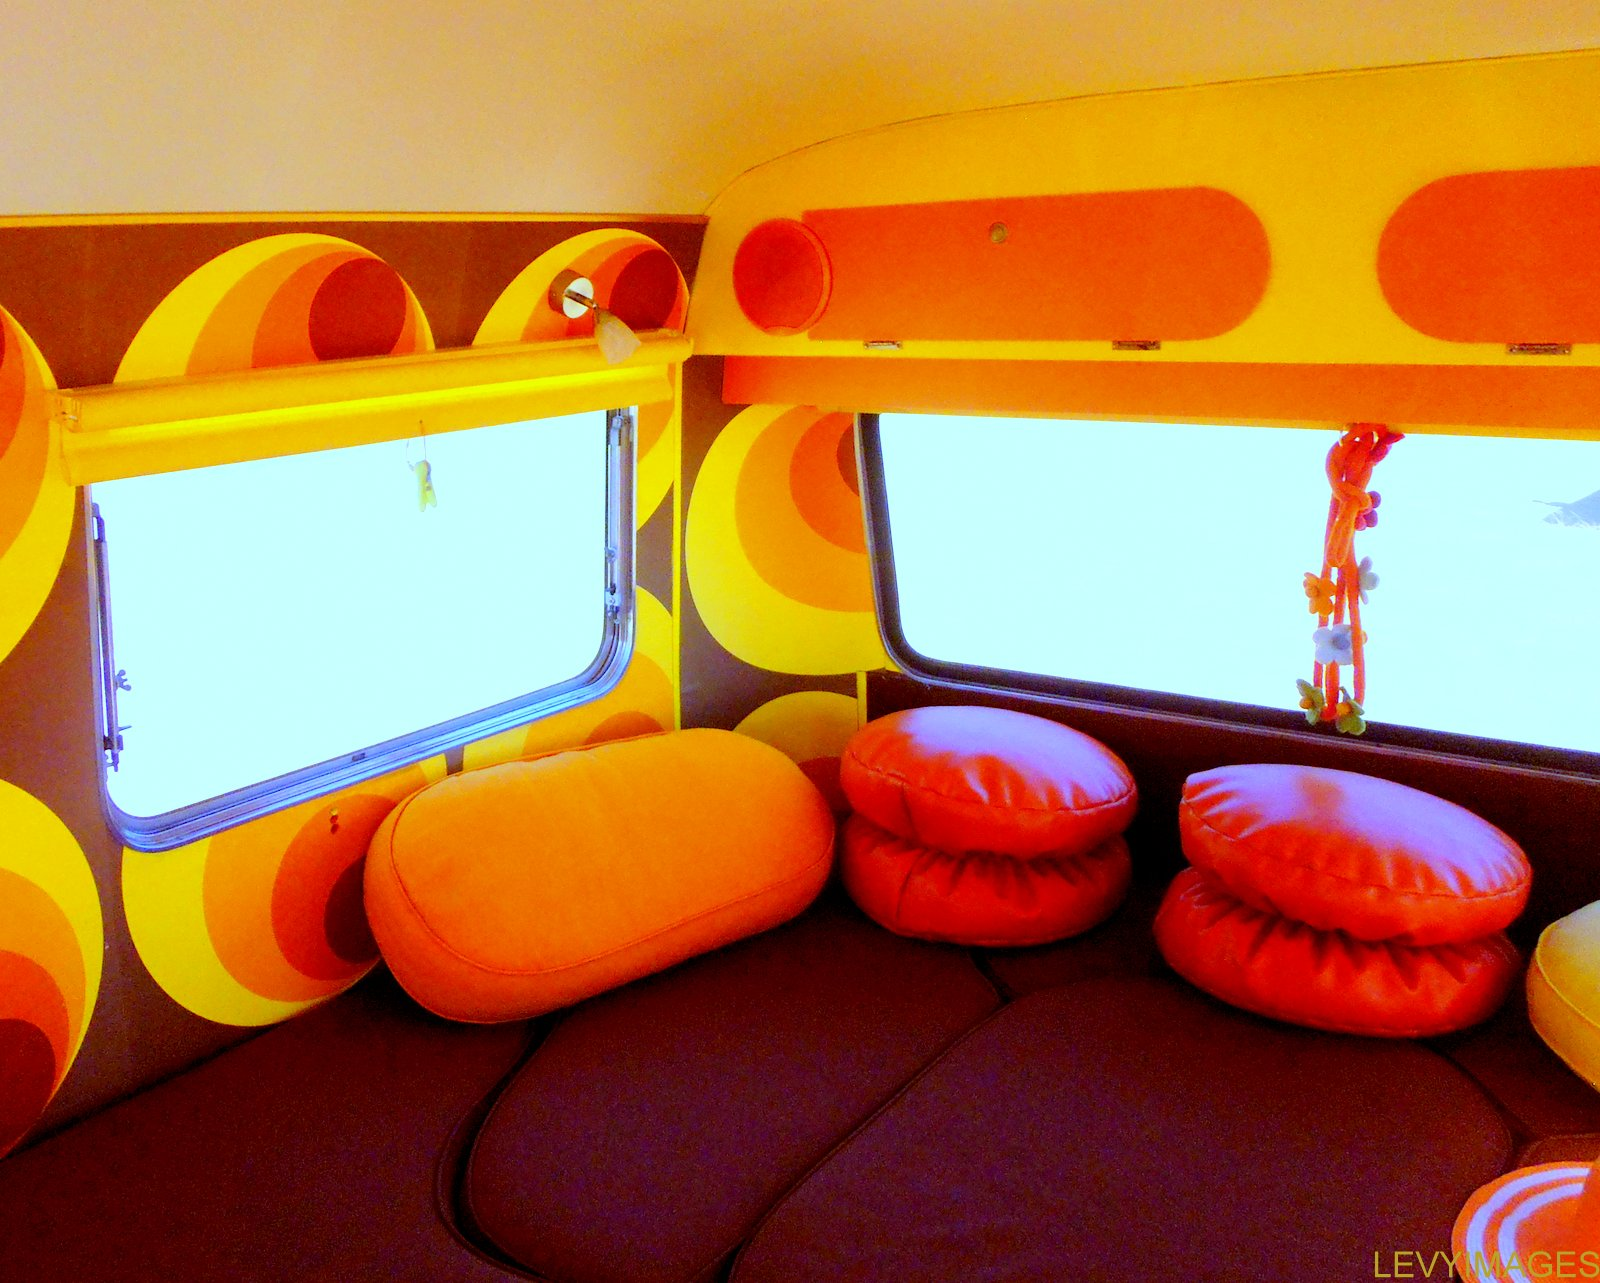 http://4.bp.blogspot.com/-0h8Osc7dSzM/UT0Omwg5qII/AAAAAAAANXY/IYV7De2o0NQ/s1600/bubbles-retro-artdeco-vintage-fibreglass-1972-oxford-concord-new-zealand-caravan-hil-mario-stapper-life-enjoyers-wanaka-freedom-camping-the-flying-tortoise-004.jpg